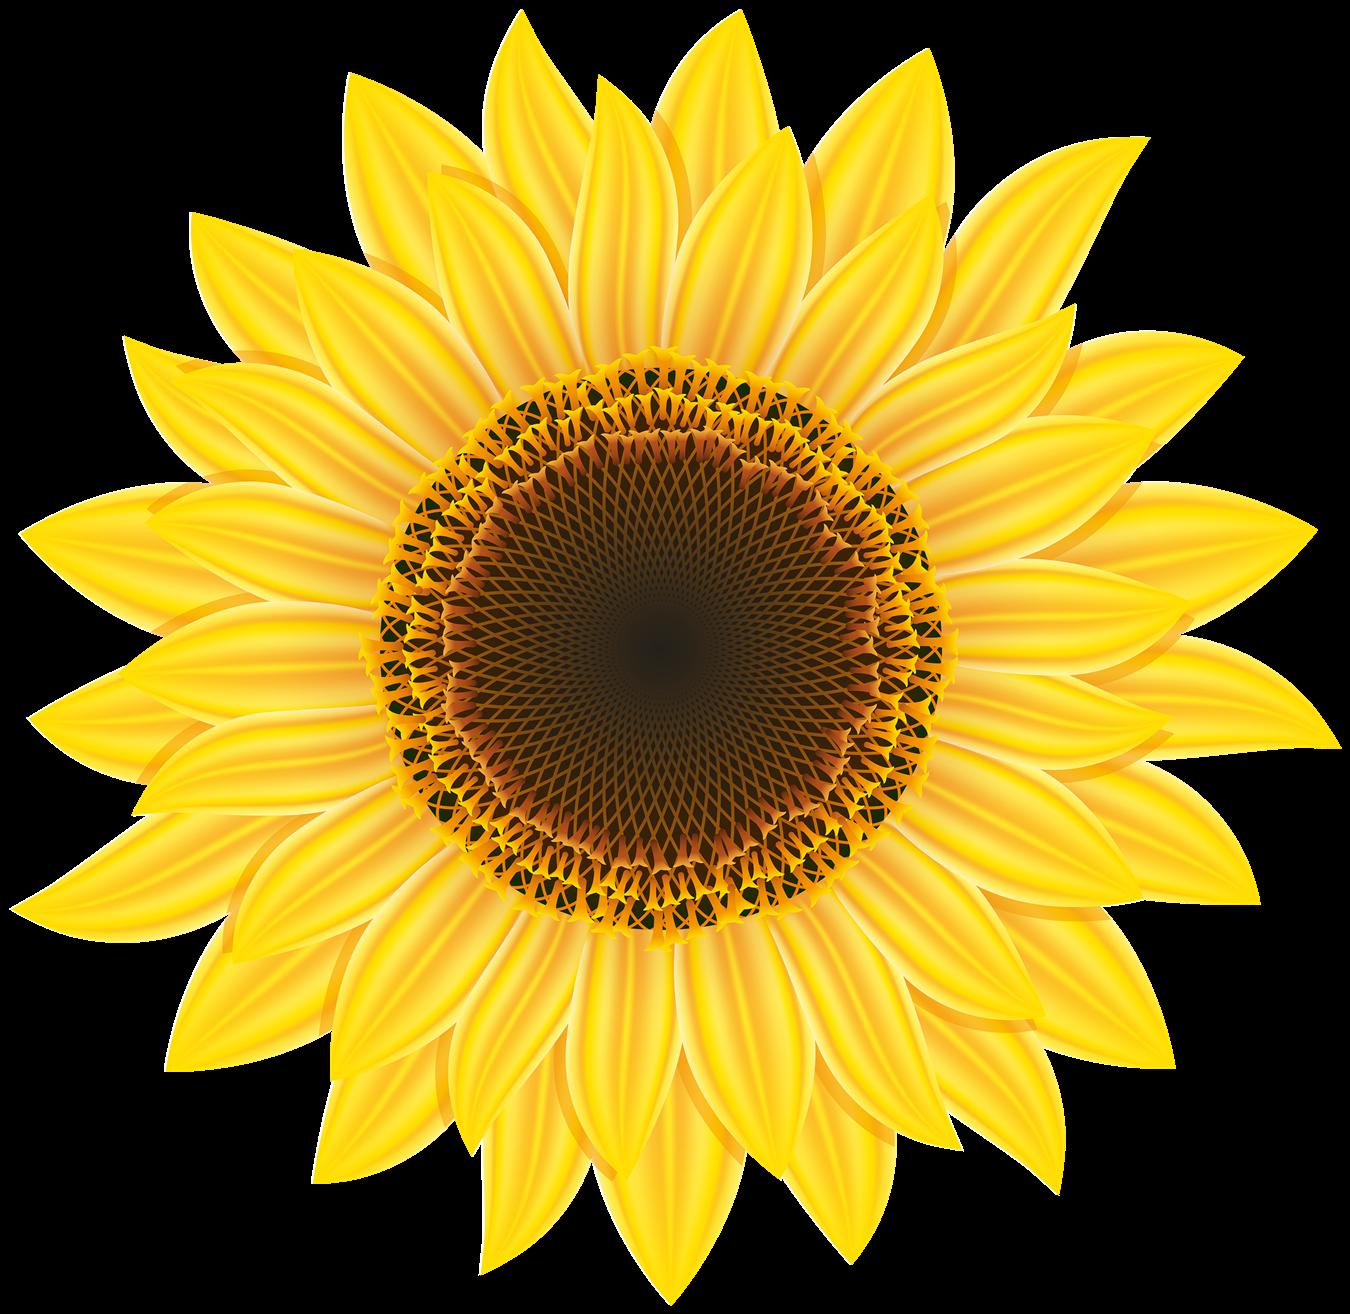 Sunflower PNG Images Transparent Free Download.